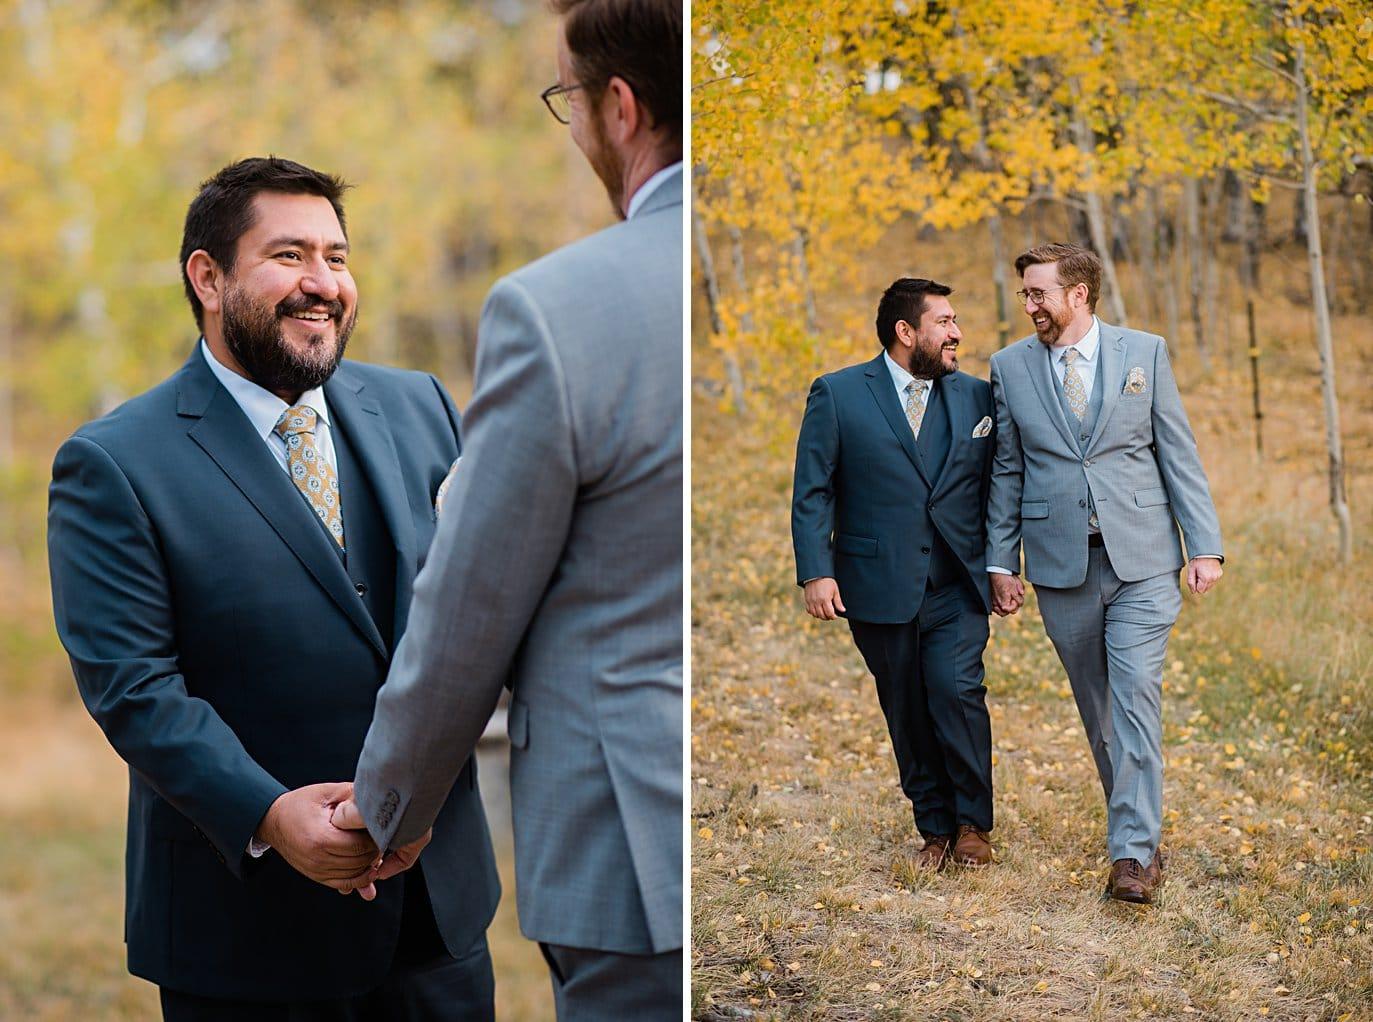 grooms walk through aspen grove in Golden Gate Canyon by Colorado gay wedding photographer Jennie Crate